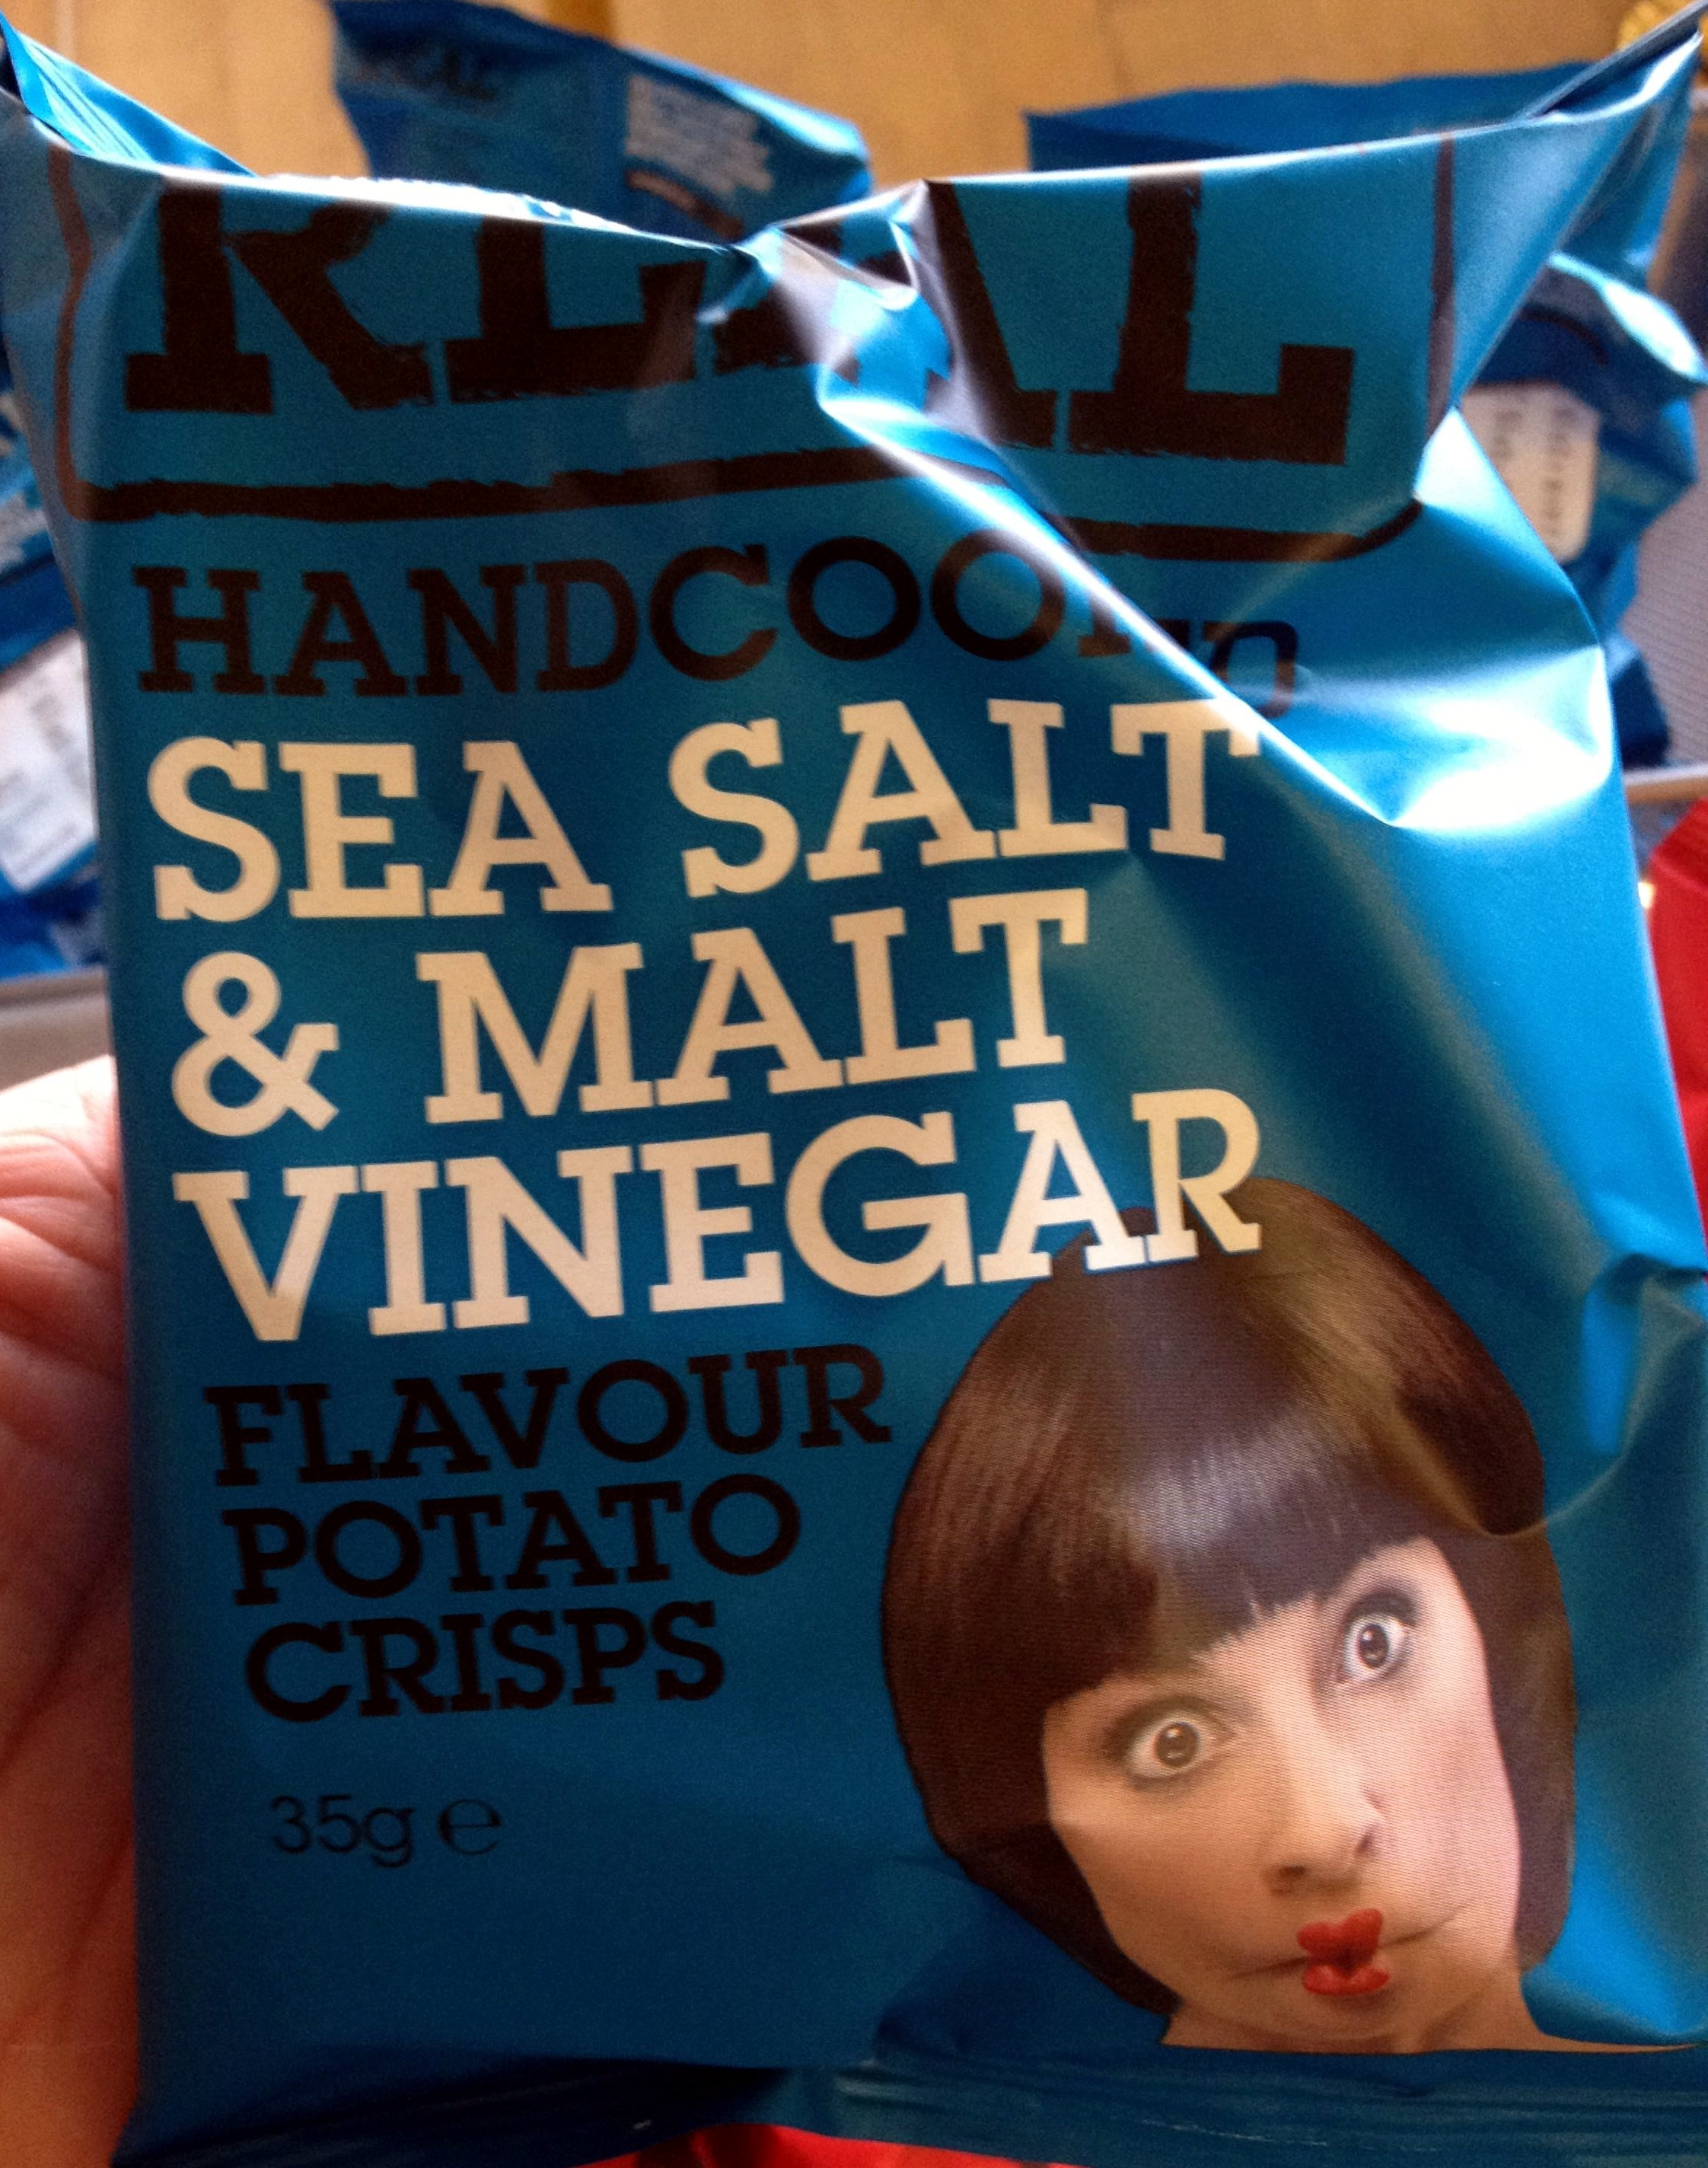 Handcookes sea salt & malt vinegar flavour potato crisps - Produit